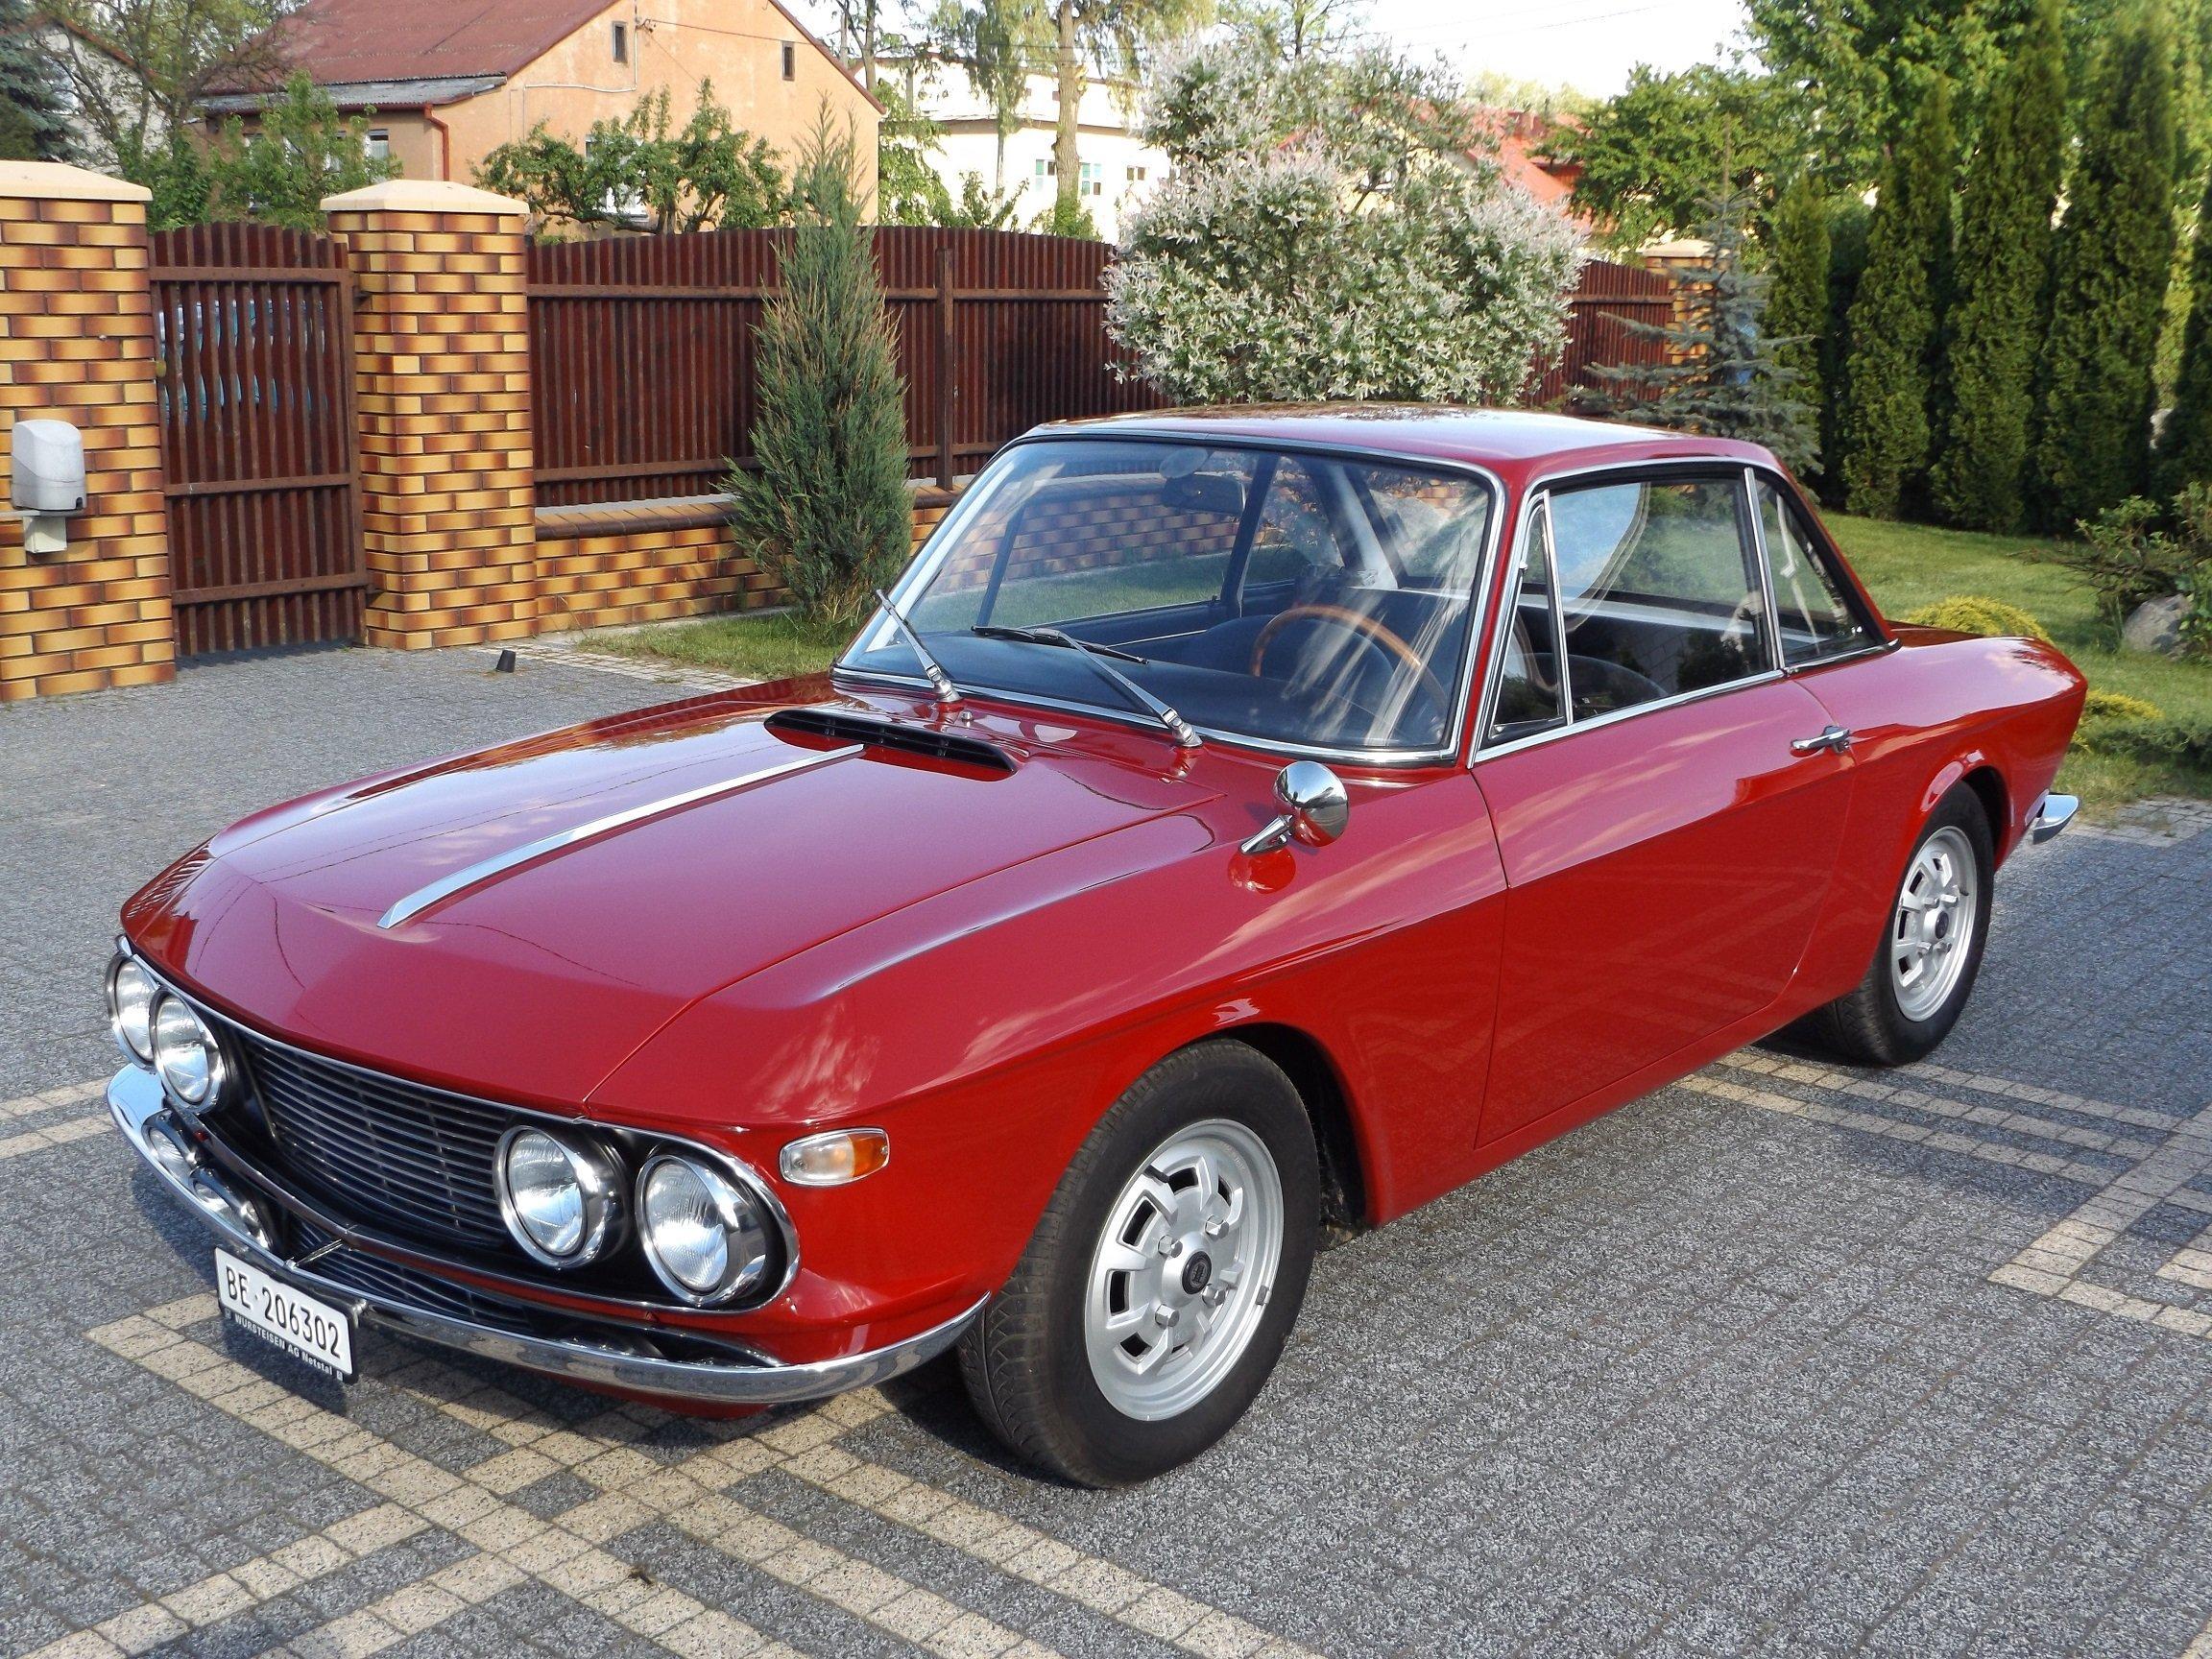 Lancia Fulvia Coupe Rallye 1.3 S